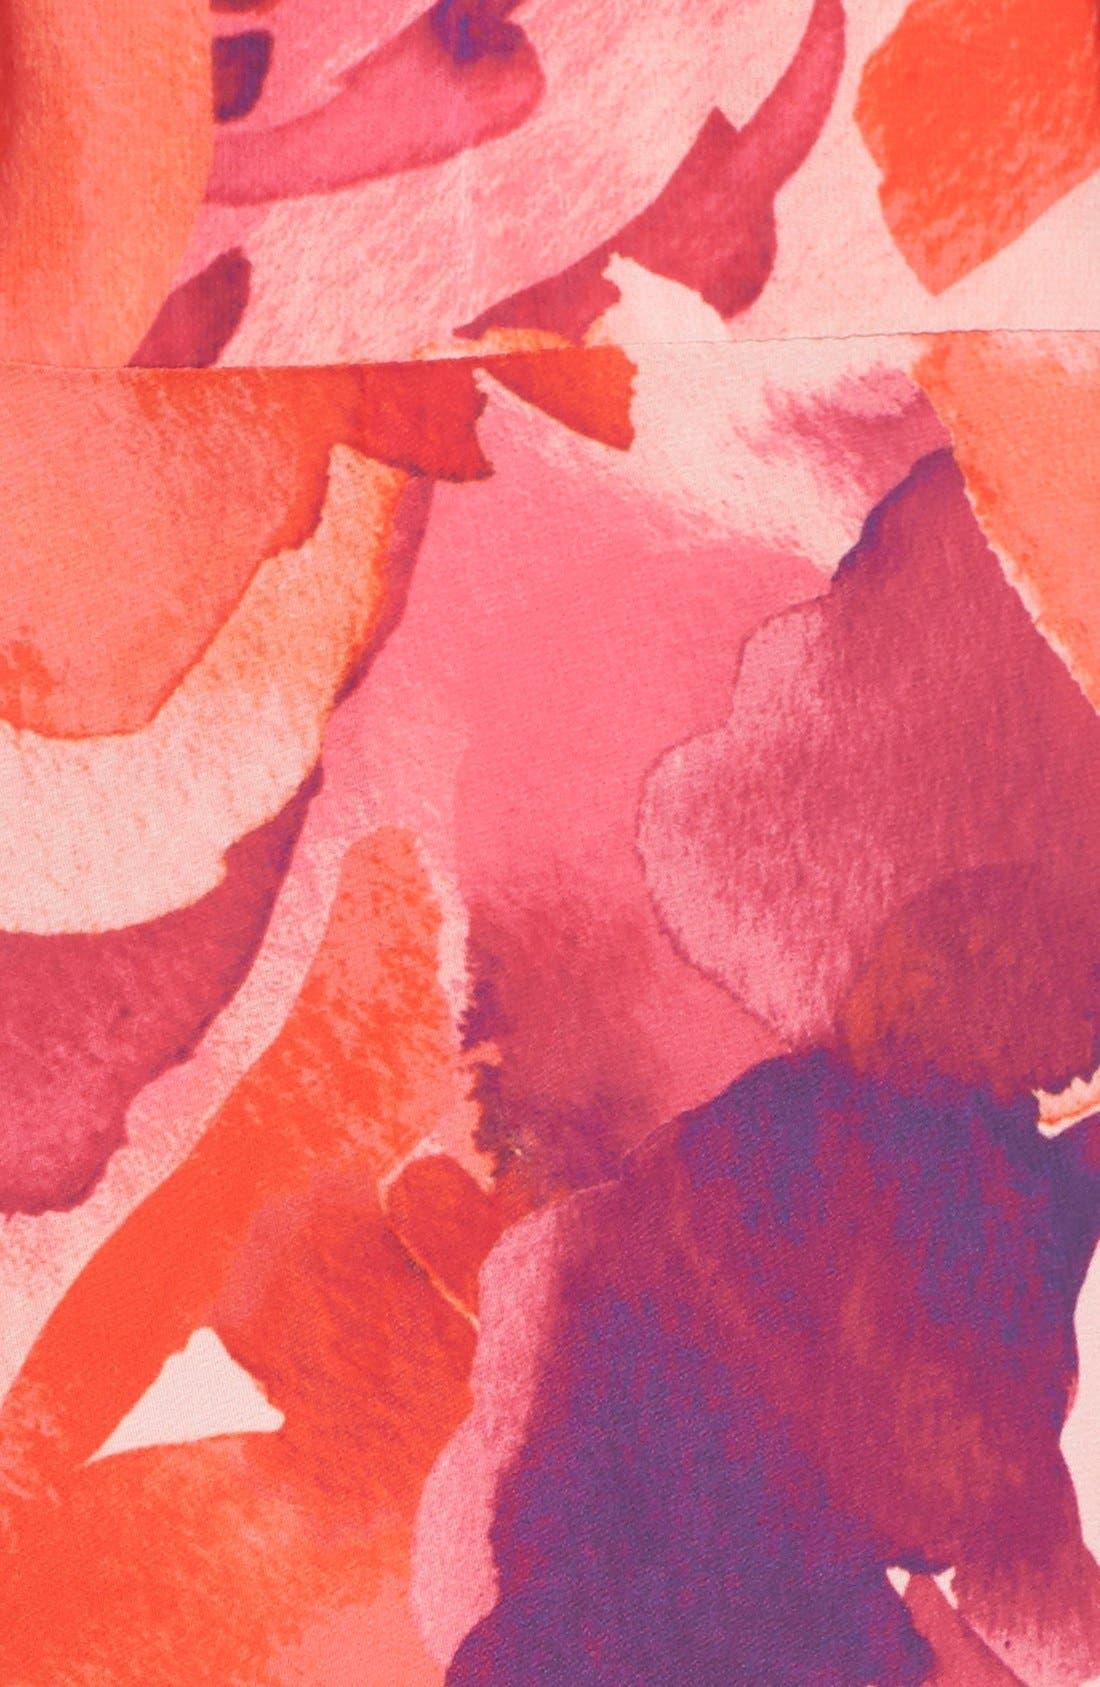 Floral Print Halter Maxi Dress,                             Alternate thumbnail 5, color,                             Pink/ Coral/ Purple